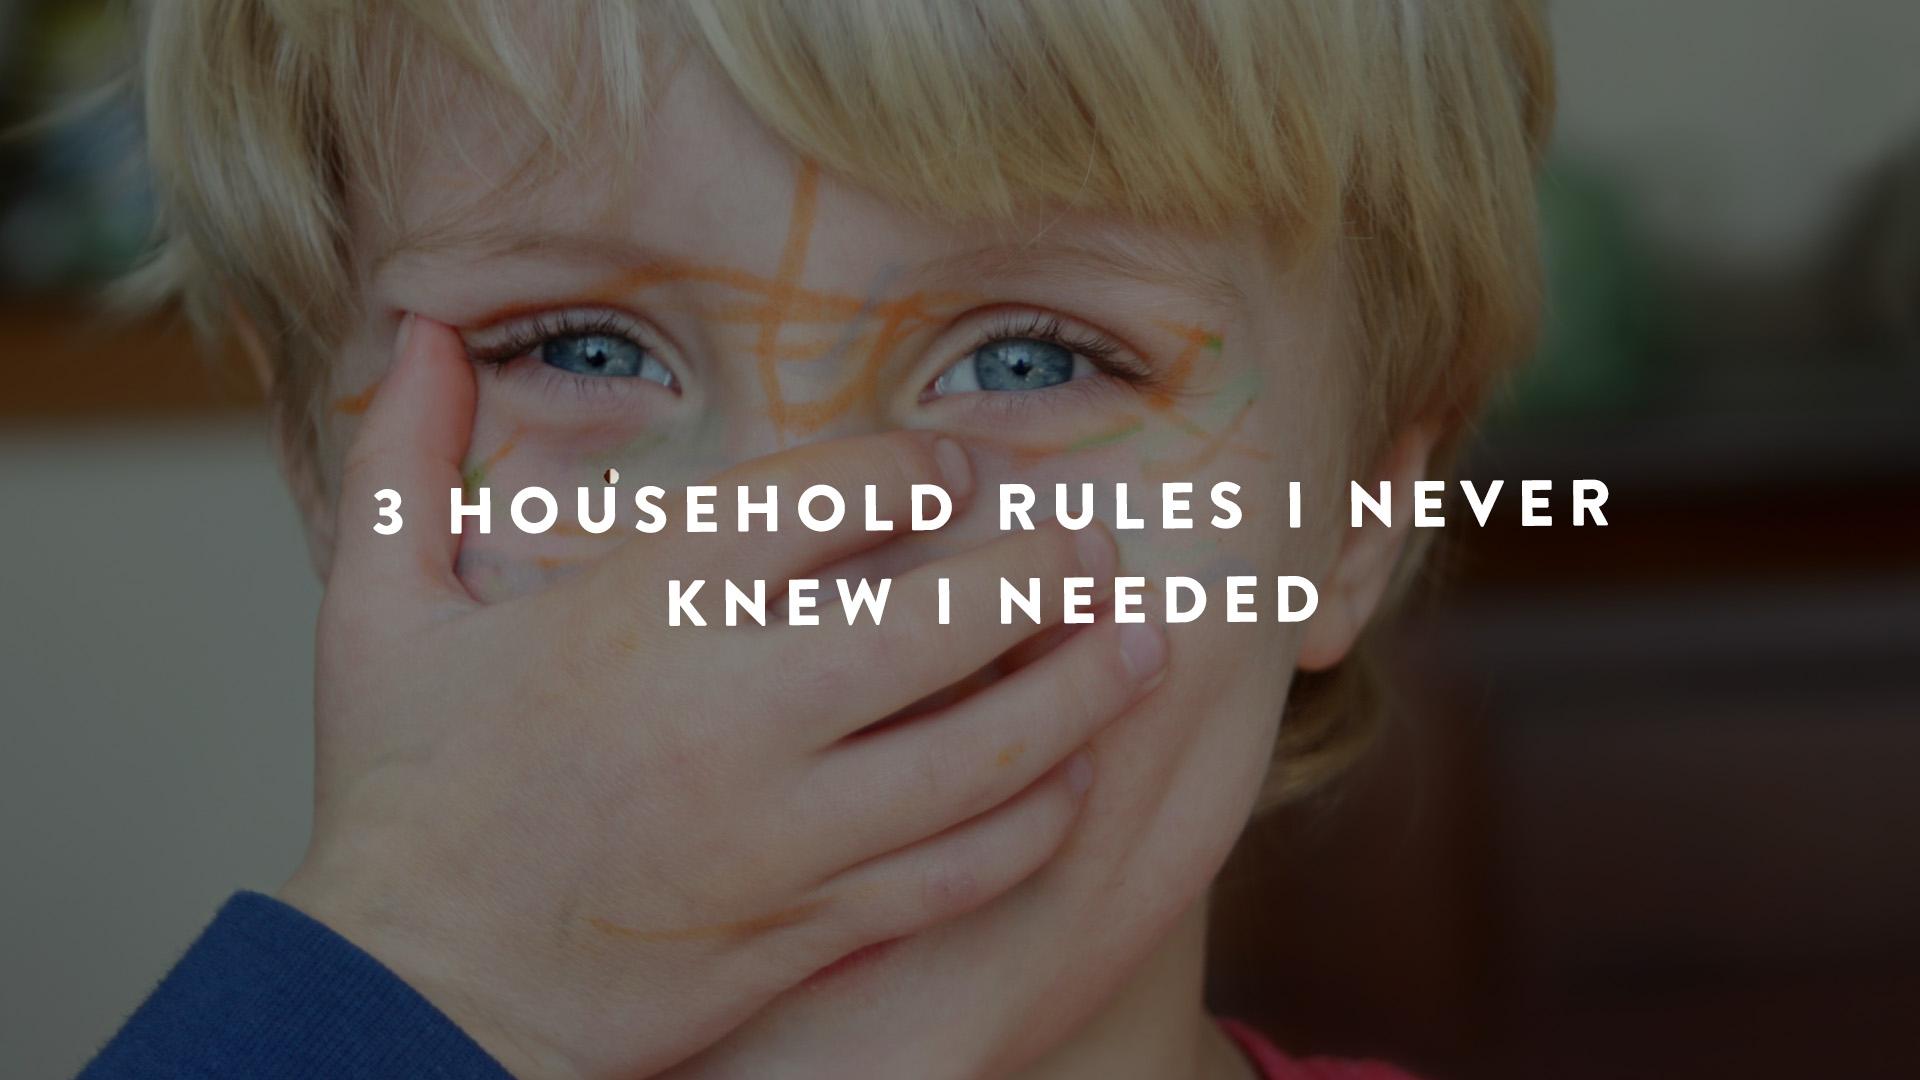 3 household rules I never knew I needed